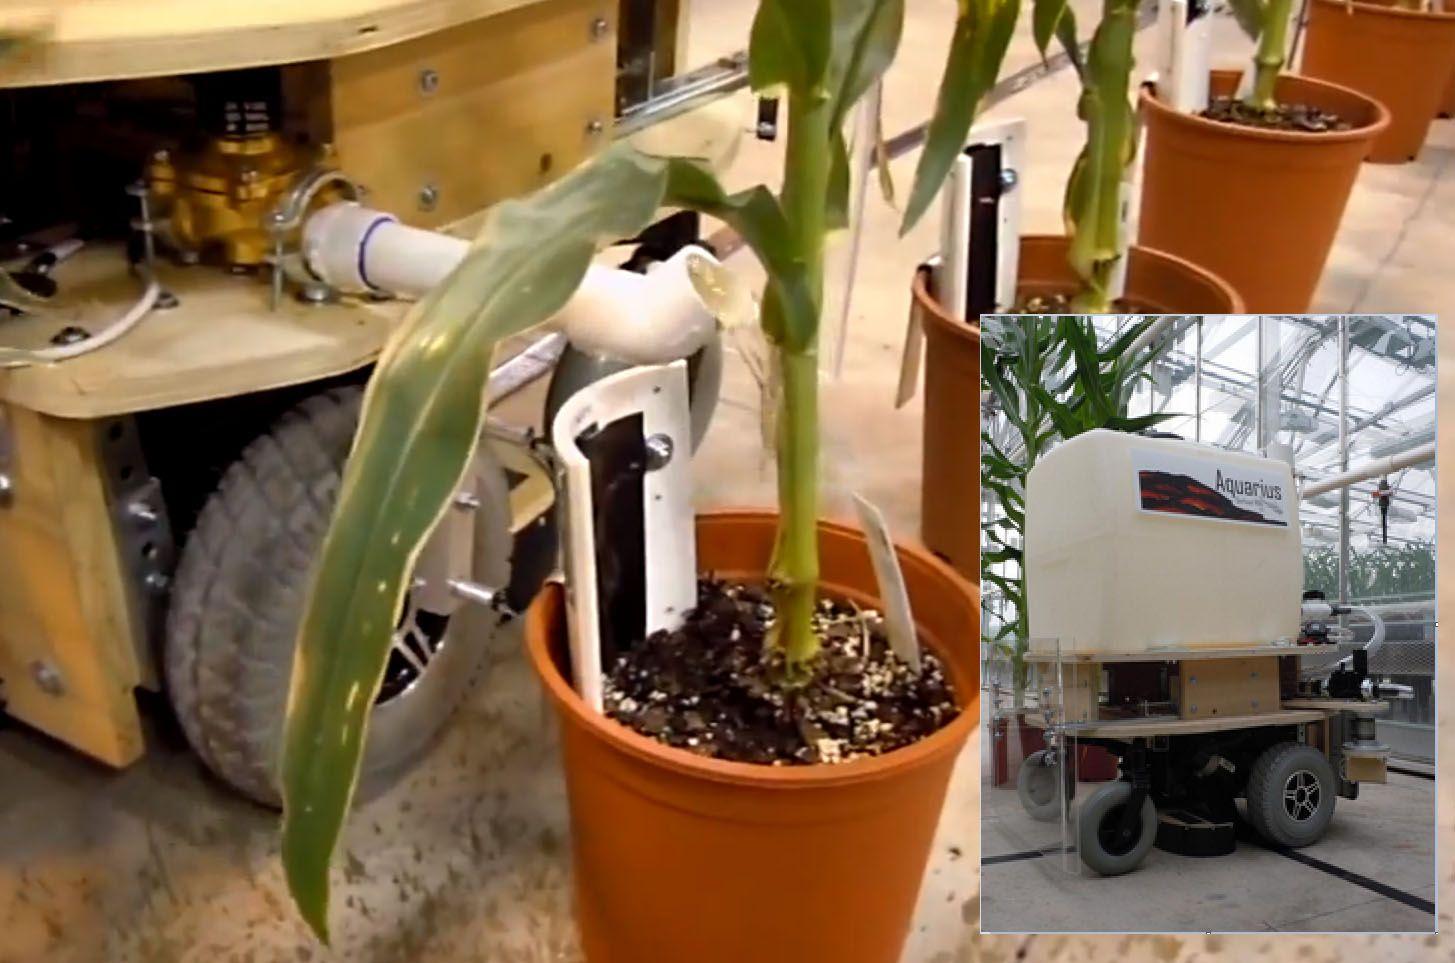 mobile greenhouse on wheels - Google Search   gardening   Pinterest ...